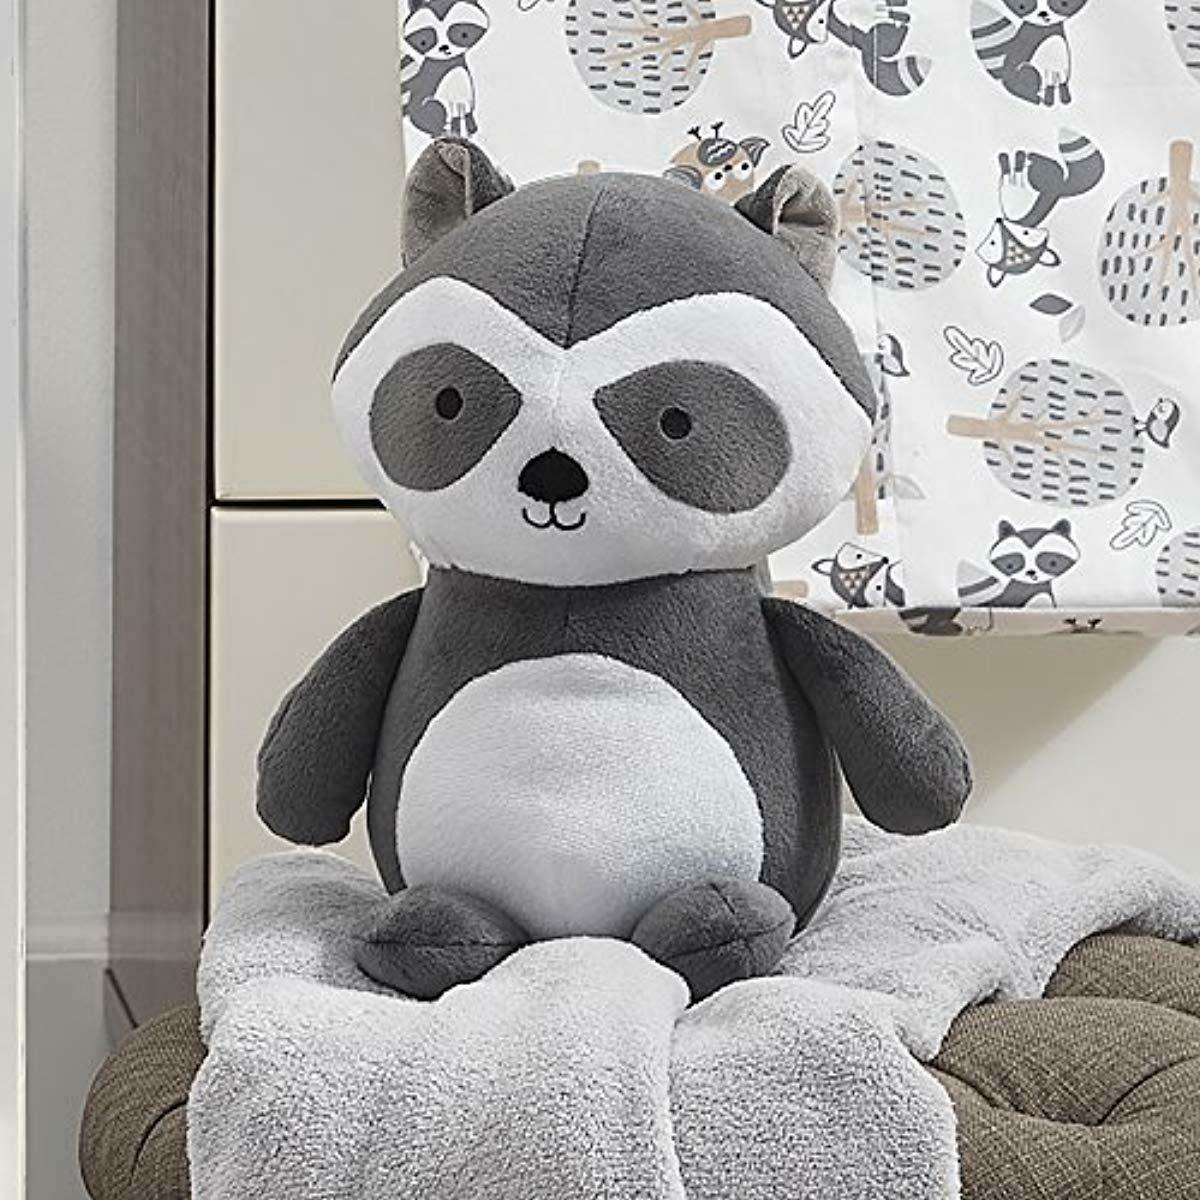 Bedtime Originals Raccoon Plush